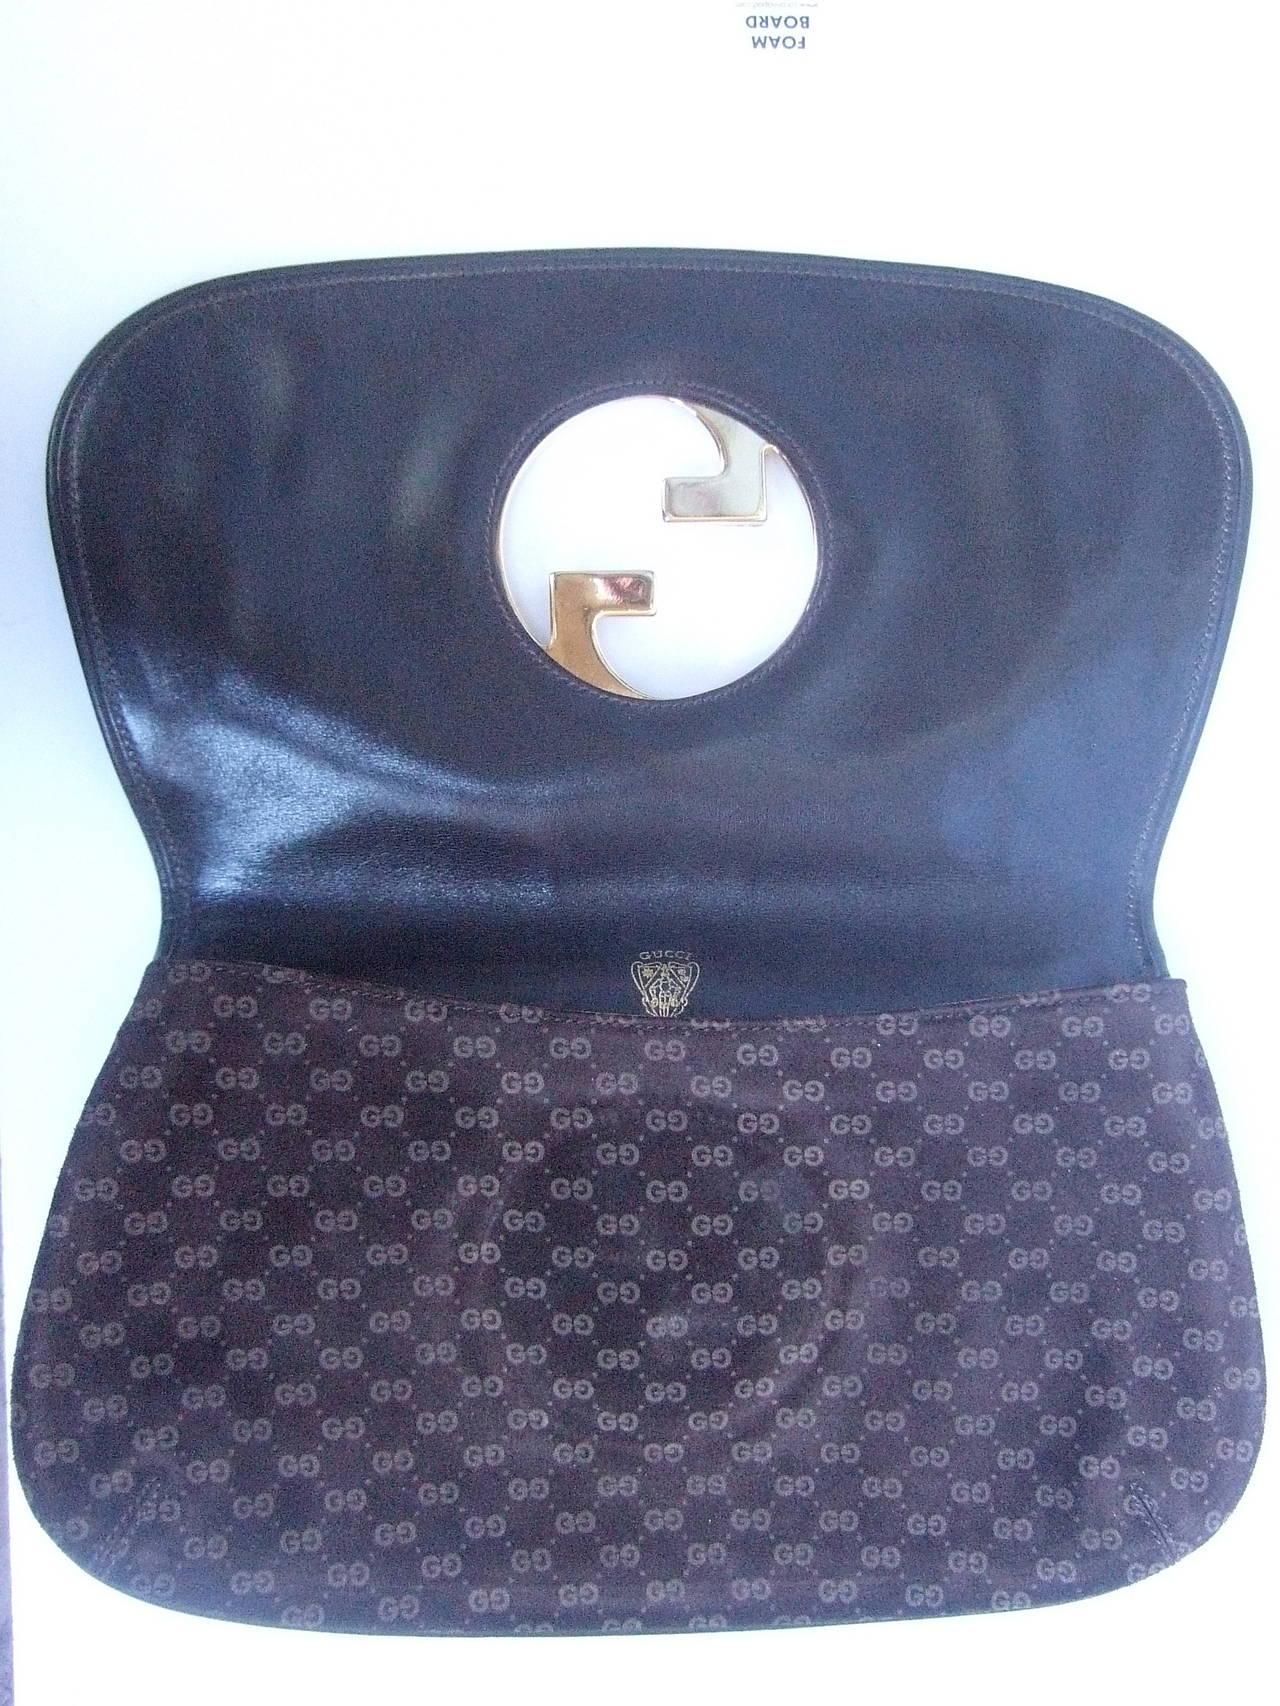 Gucci Sleek Brown Suede Blondie Clutch Made In Italy C